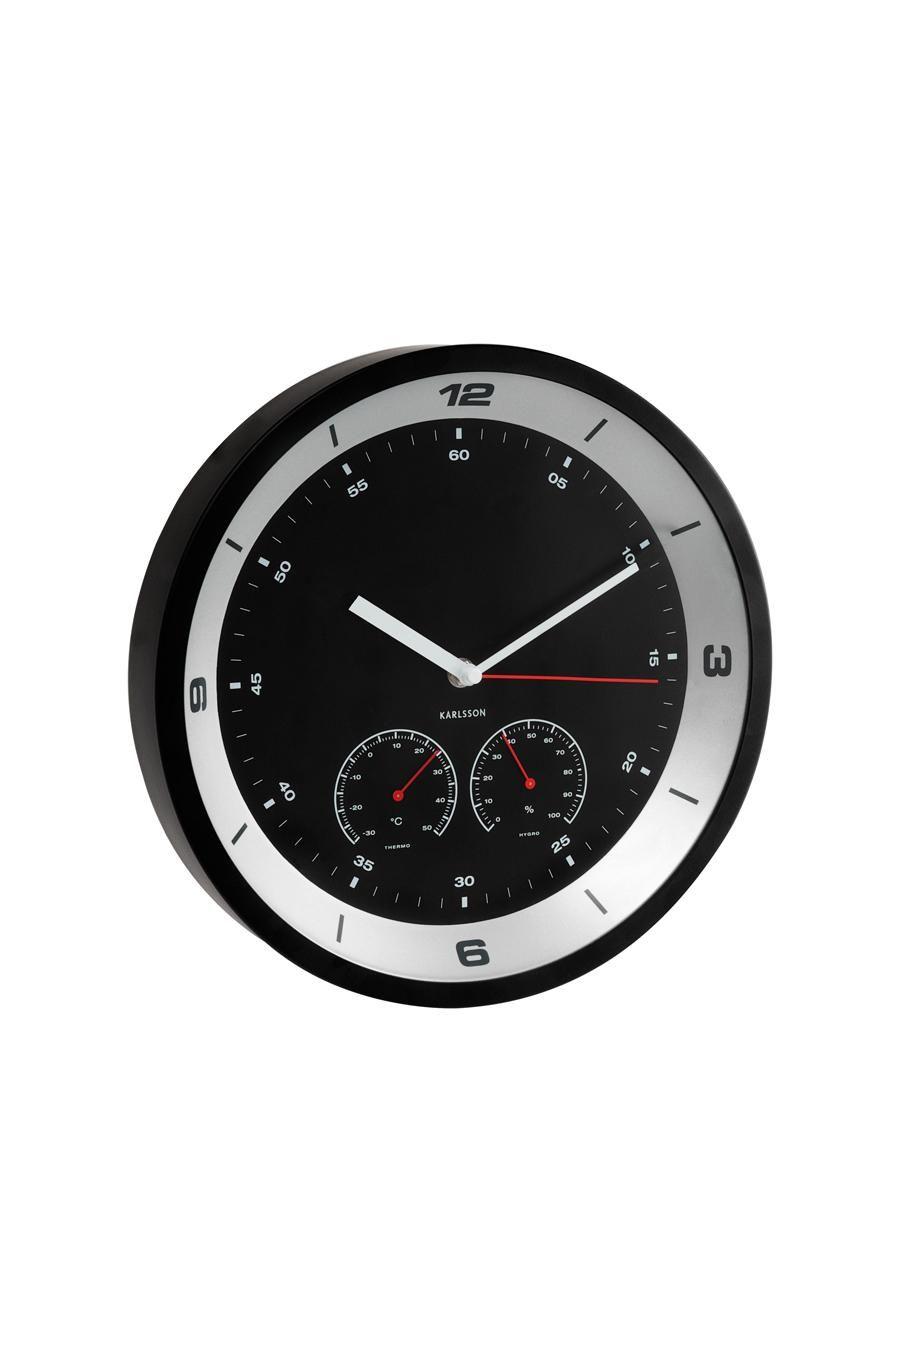 Karlsson KA5353 Wall Clock Fast Lane